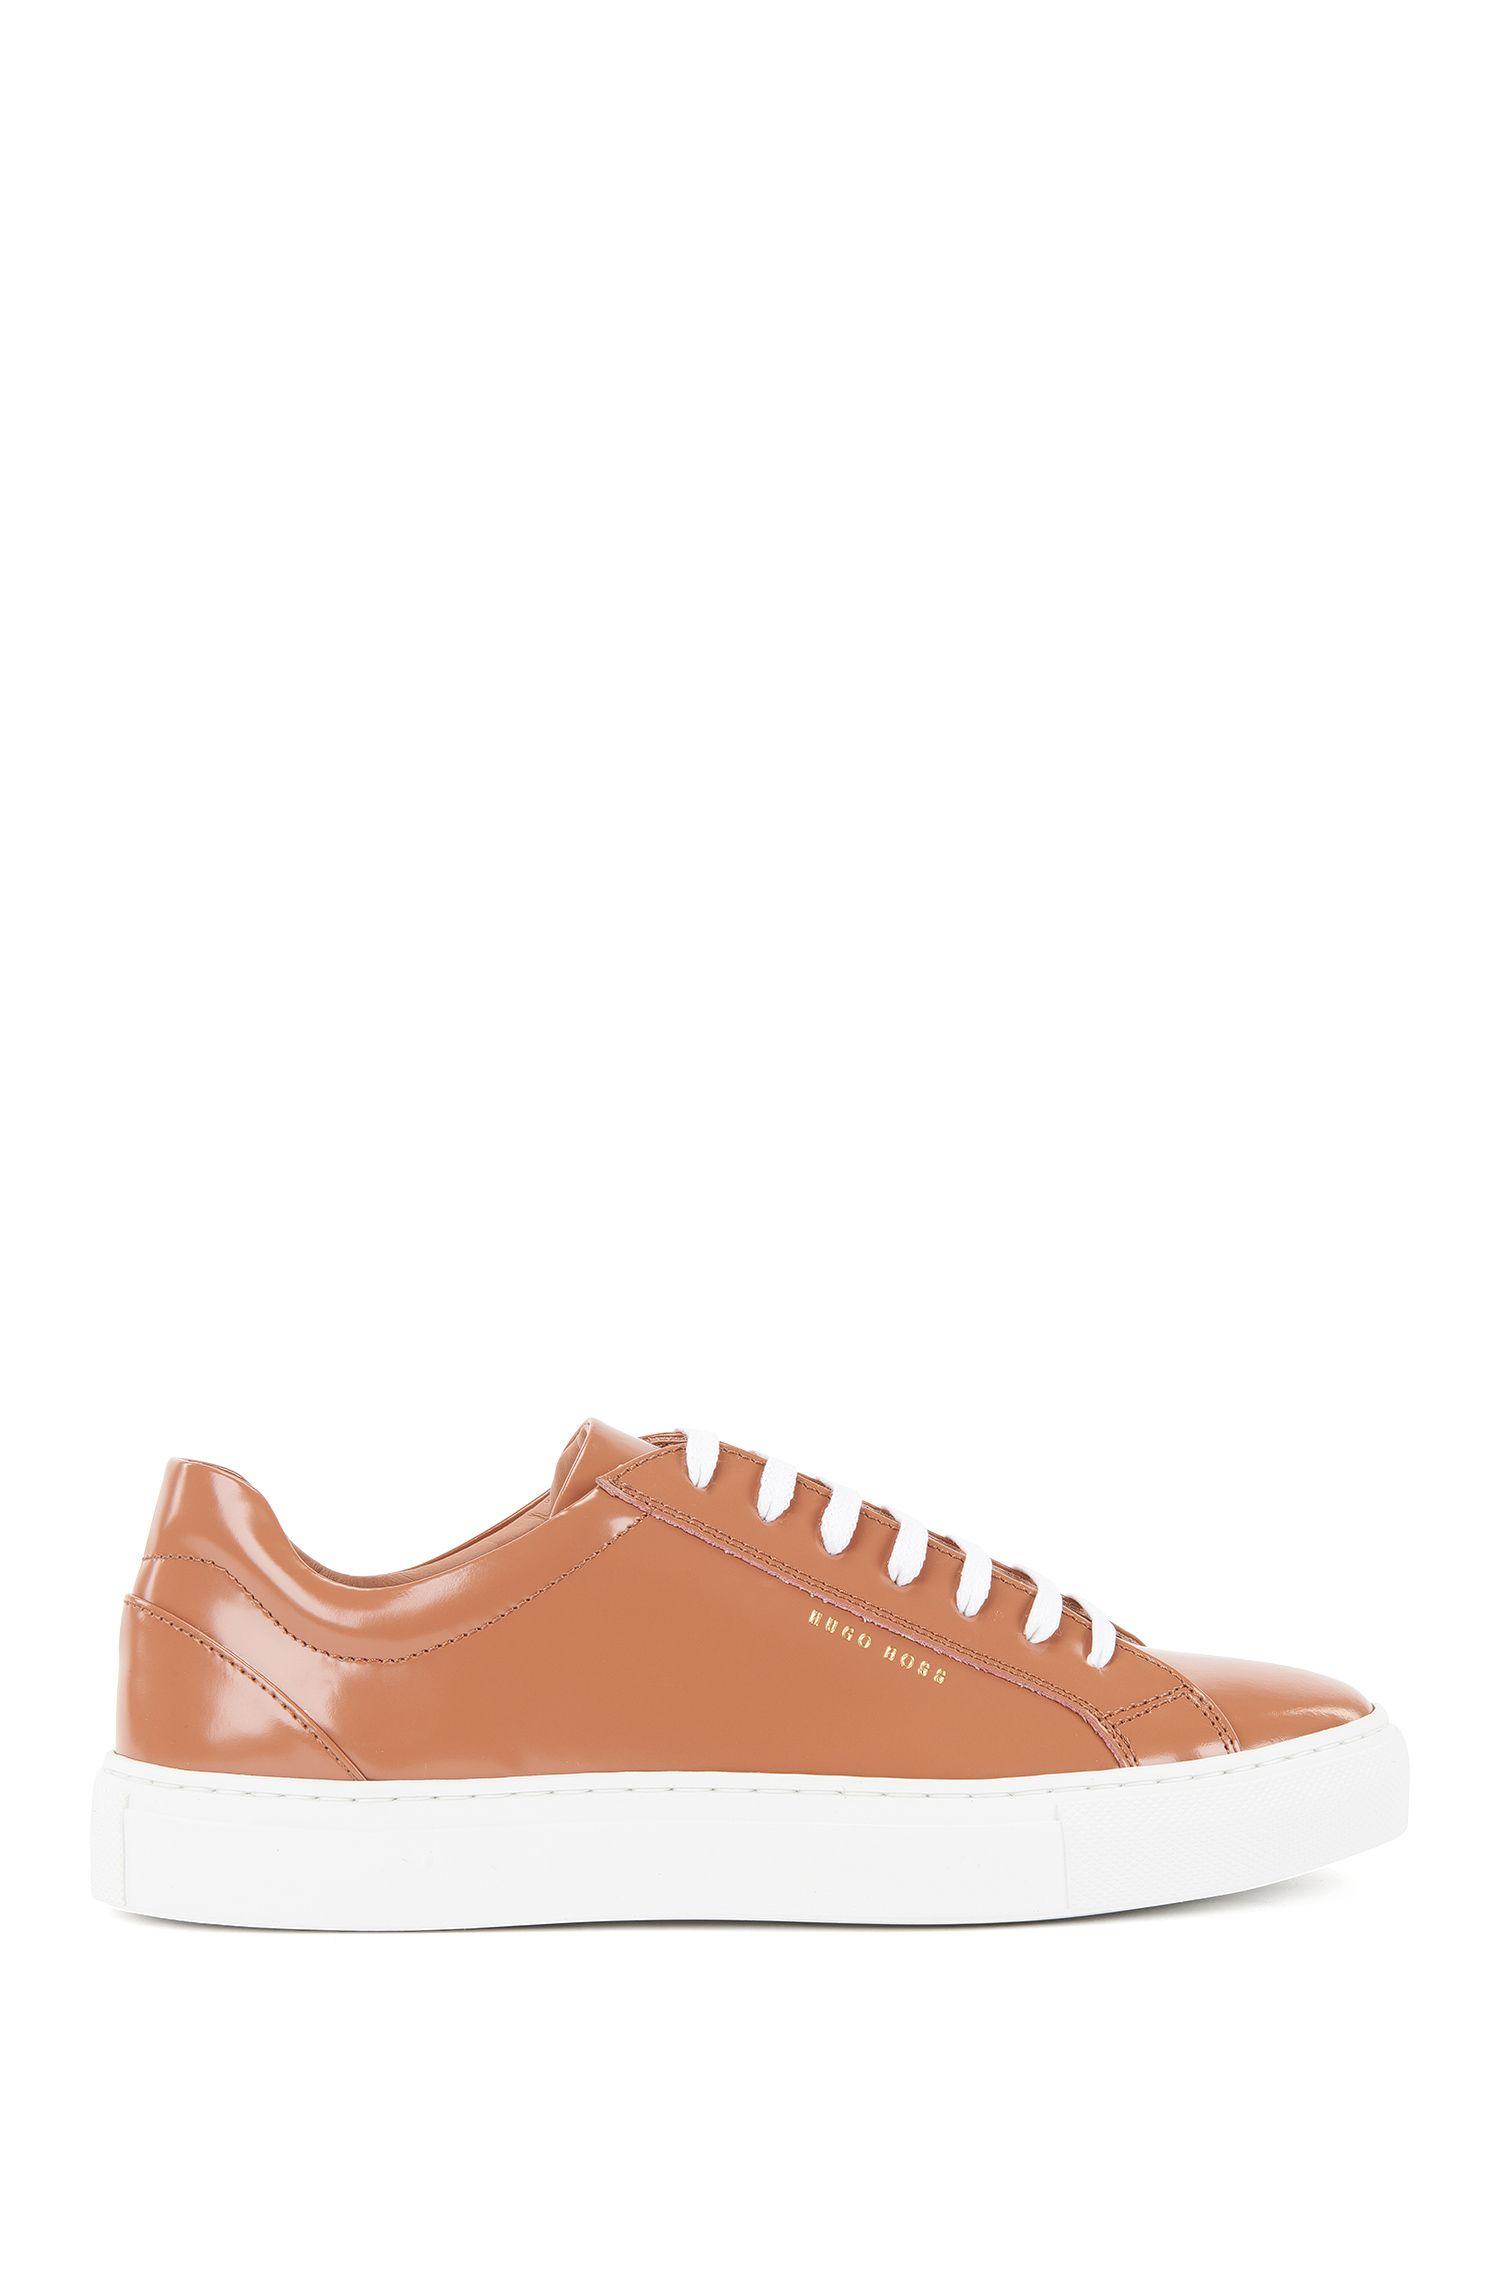 Sneakers low-top in pelle spazzolata